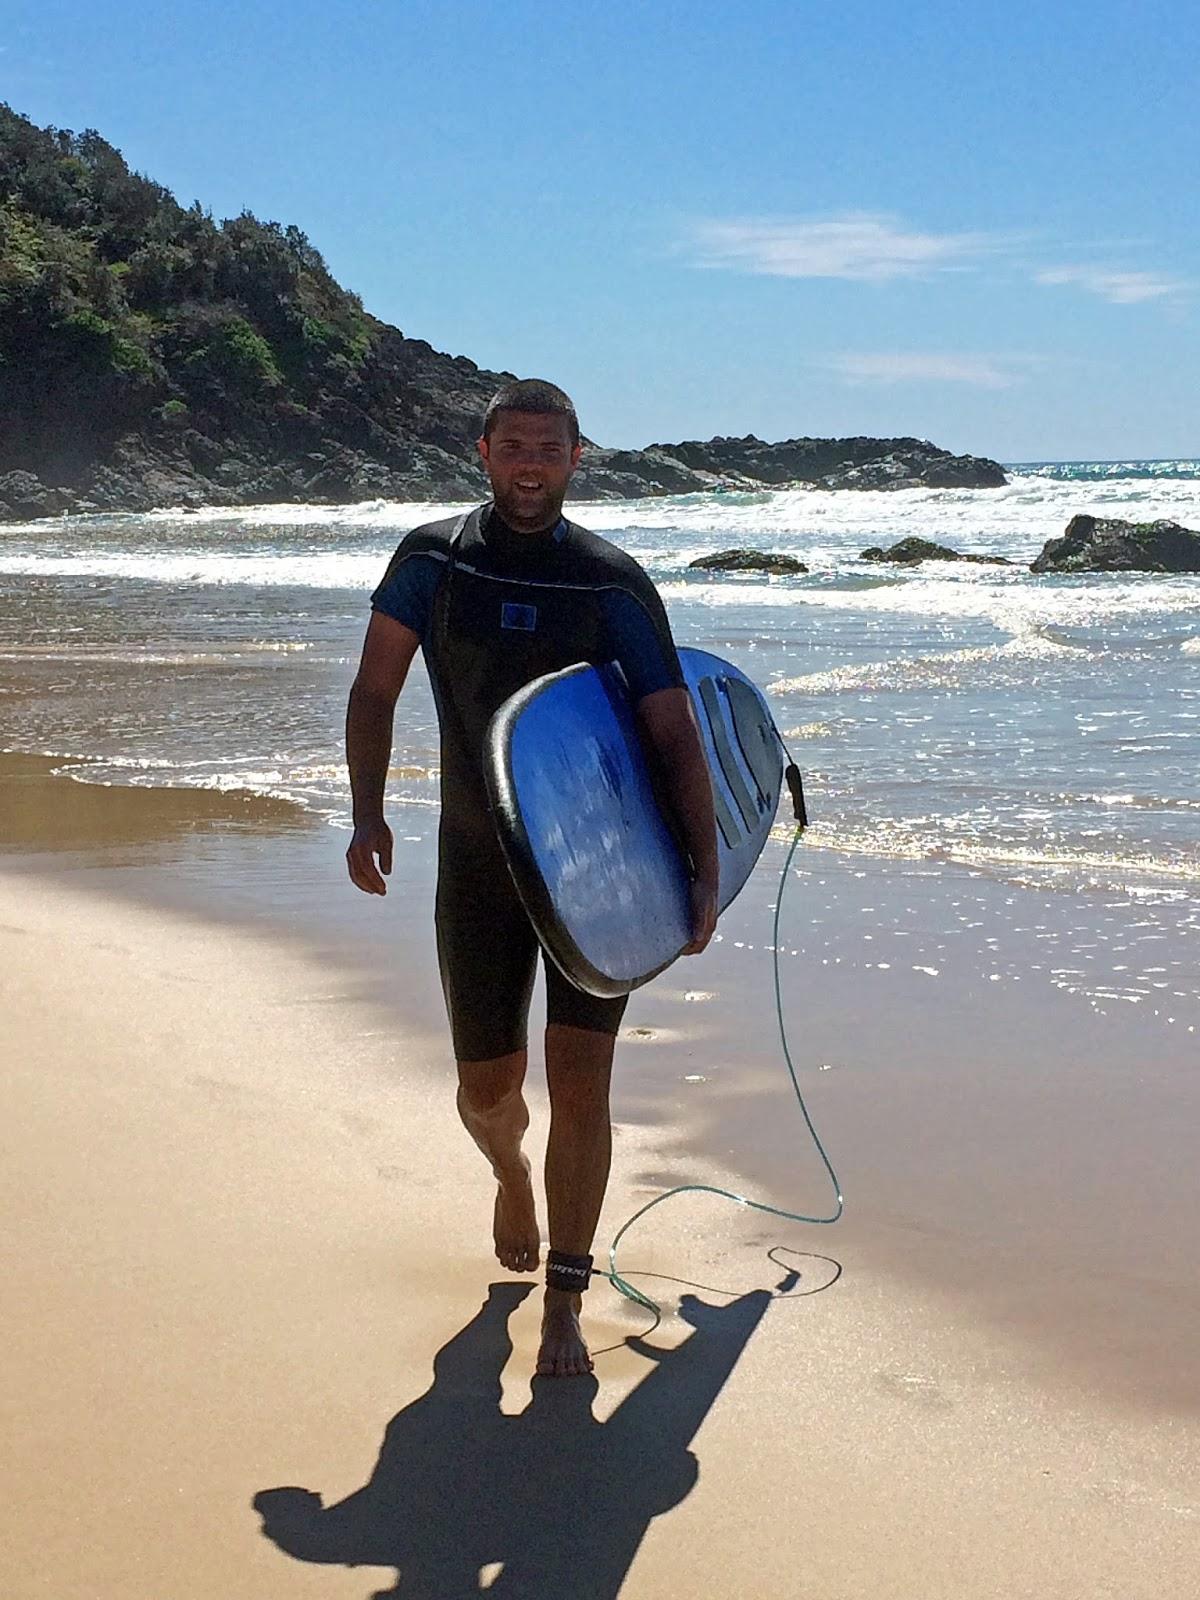 Male Surfer Port Macquarie